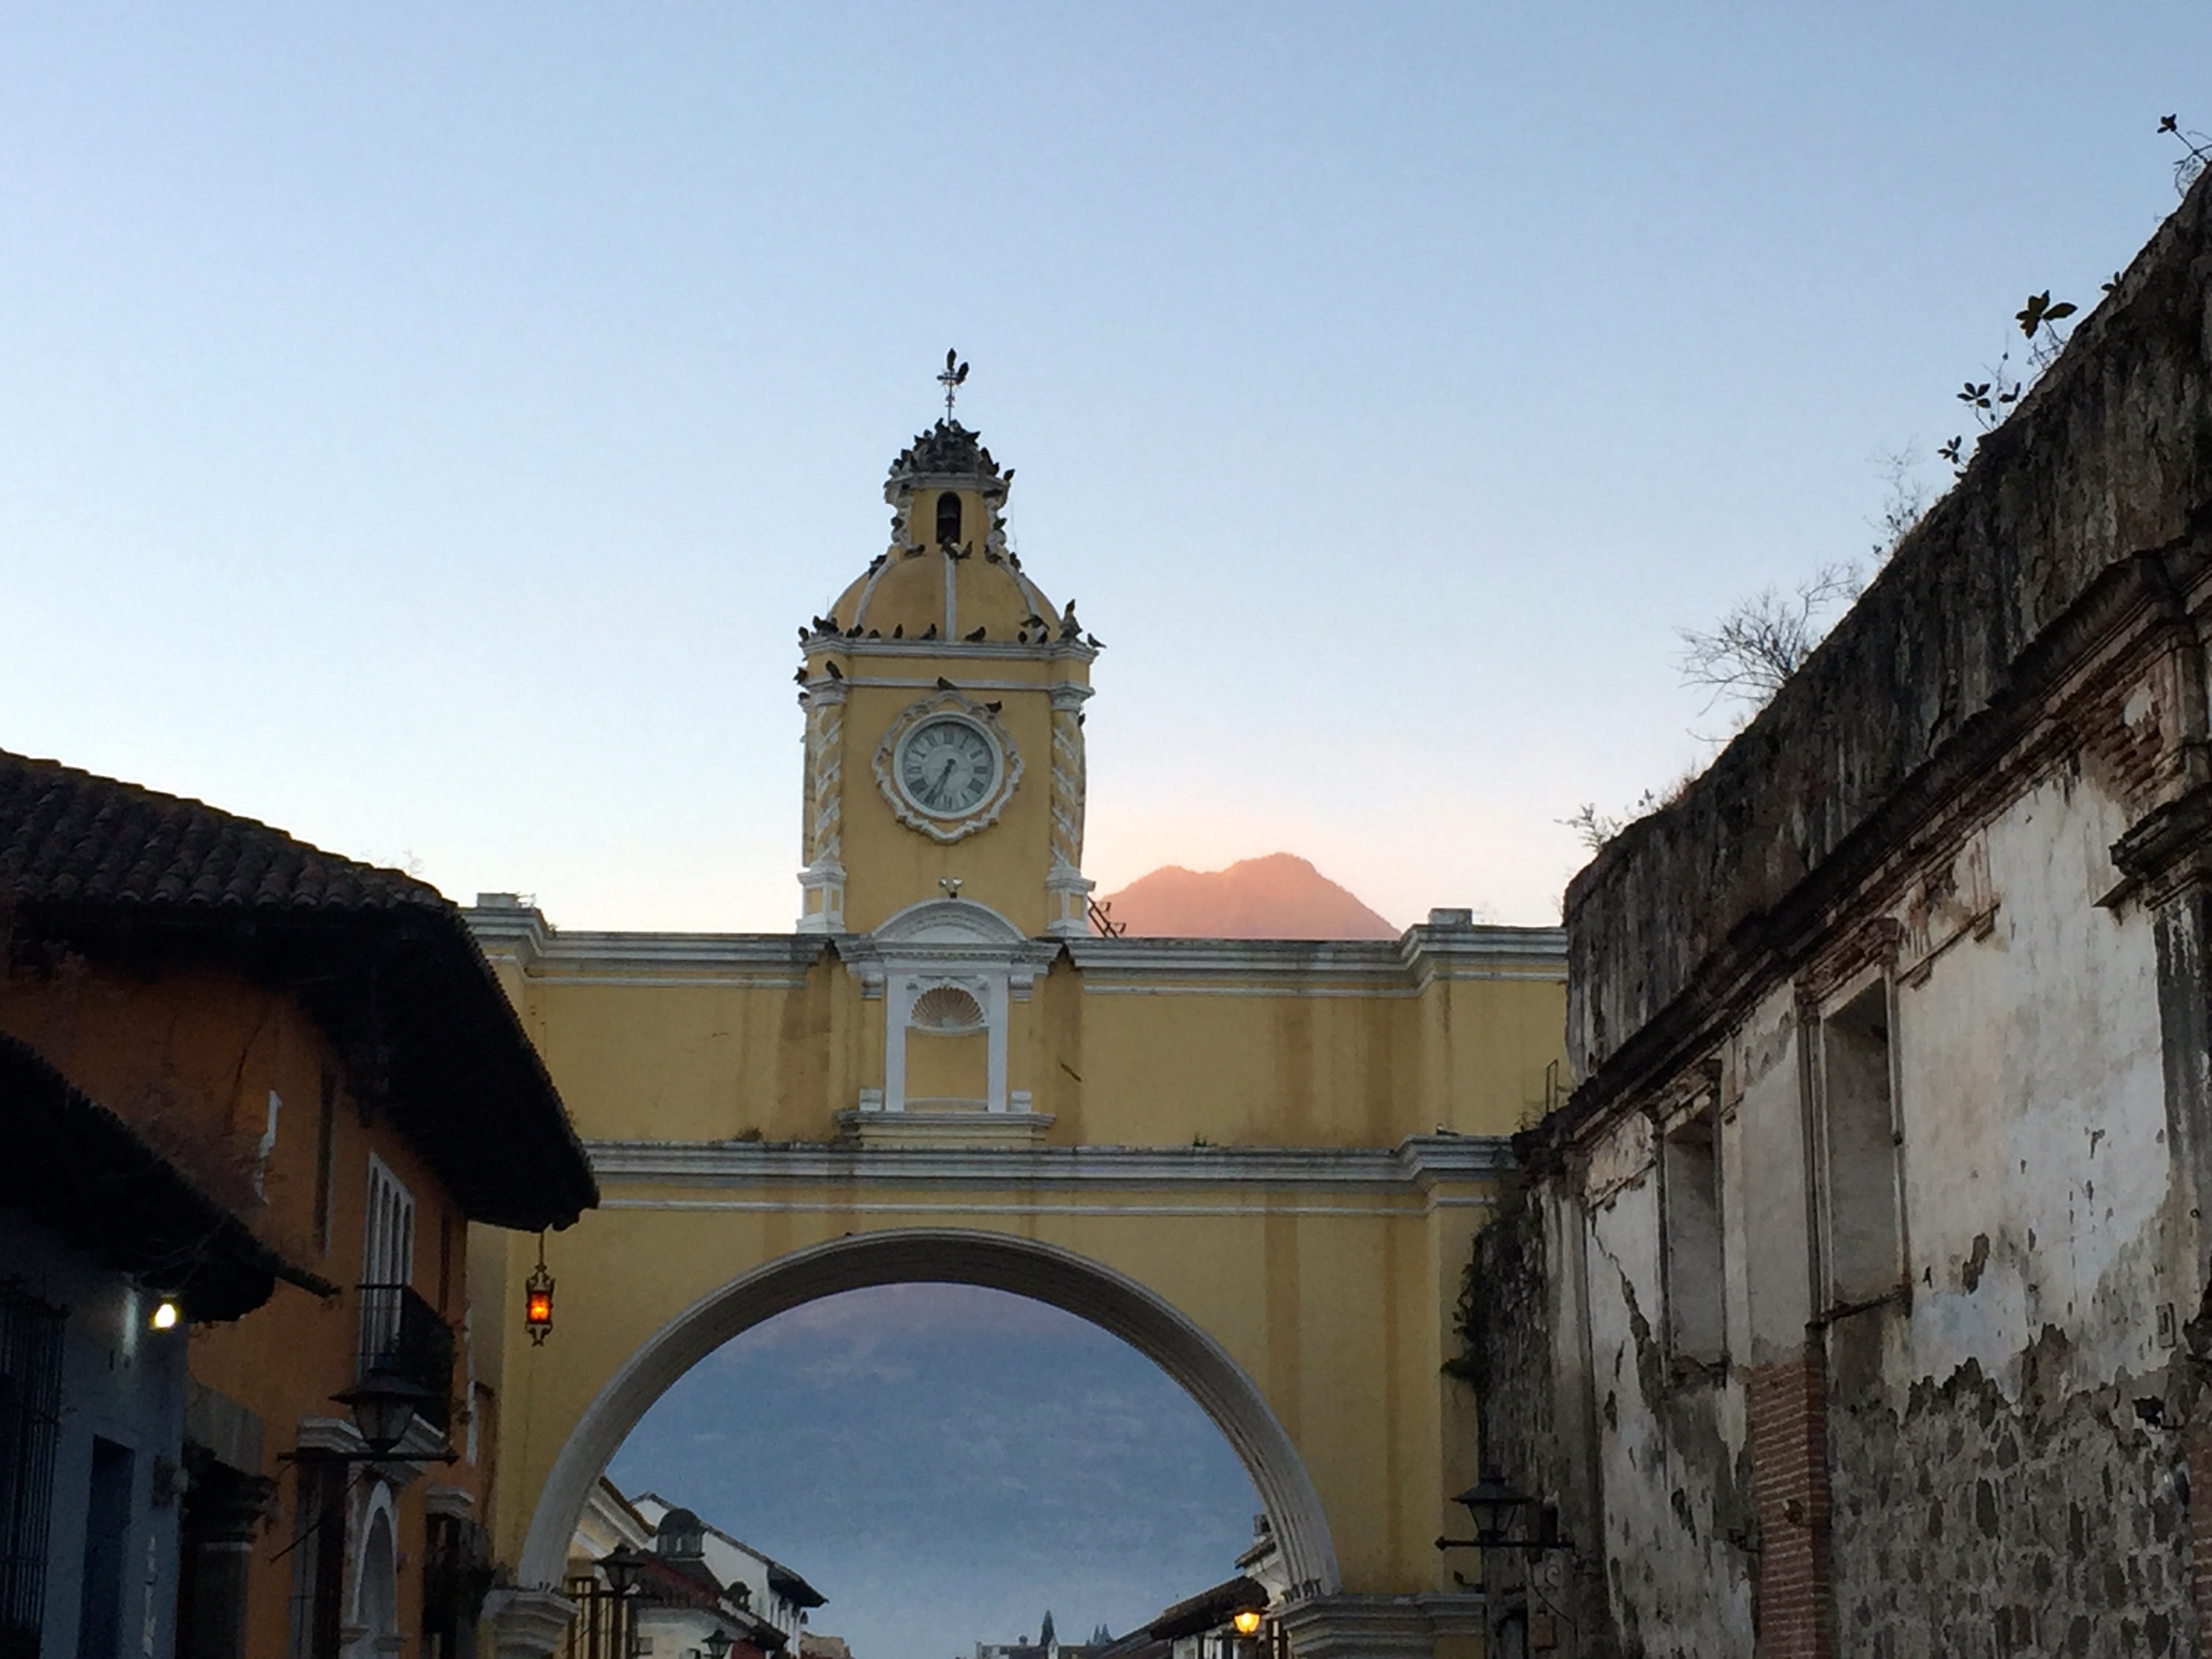 First morning in Antigua...ahhhh...beautiful...